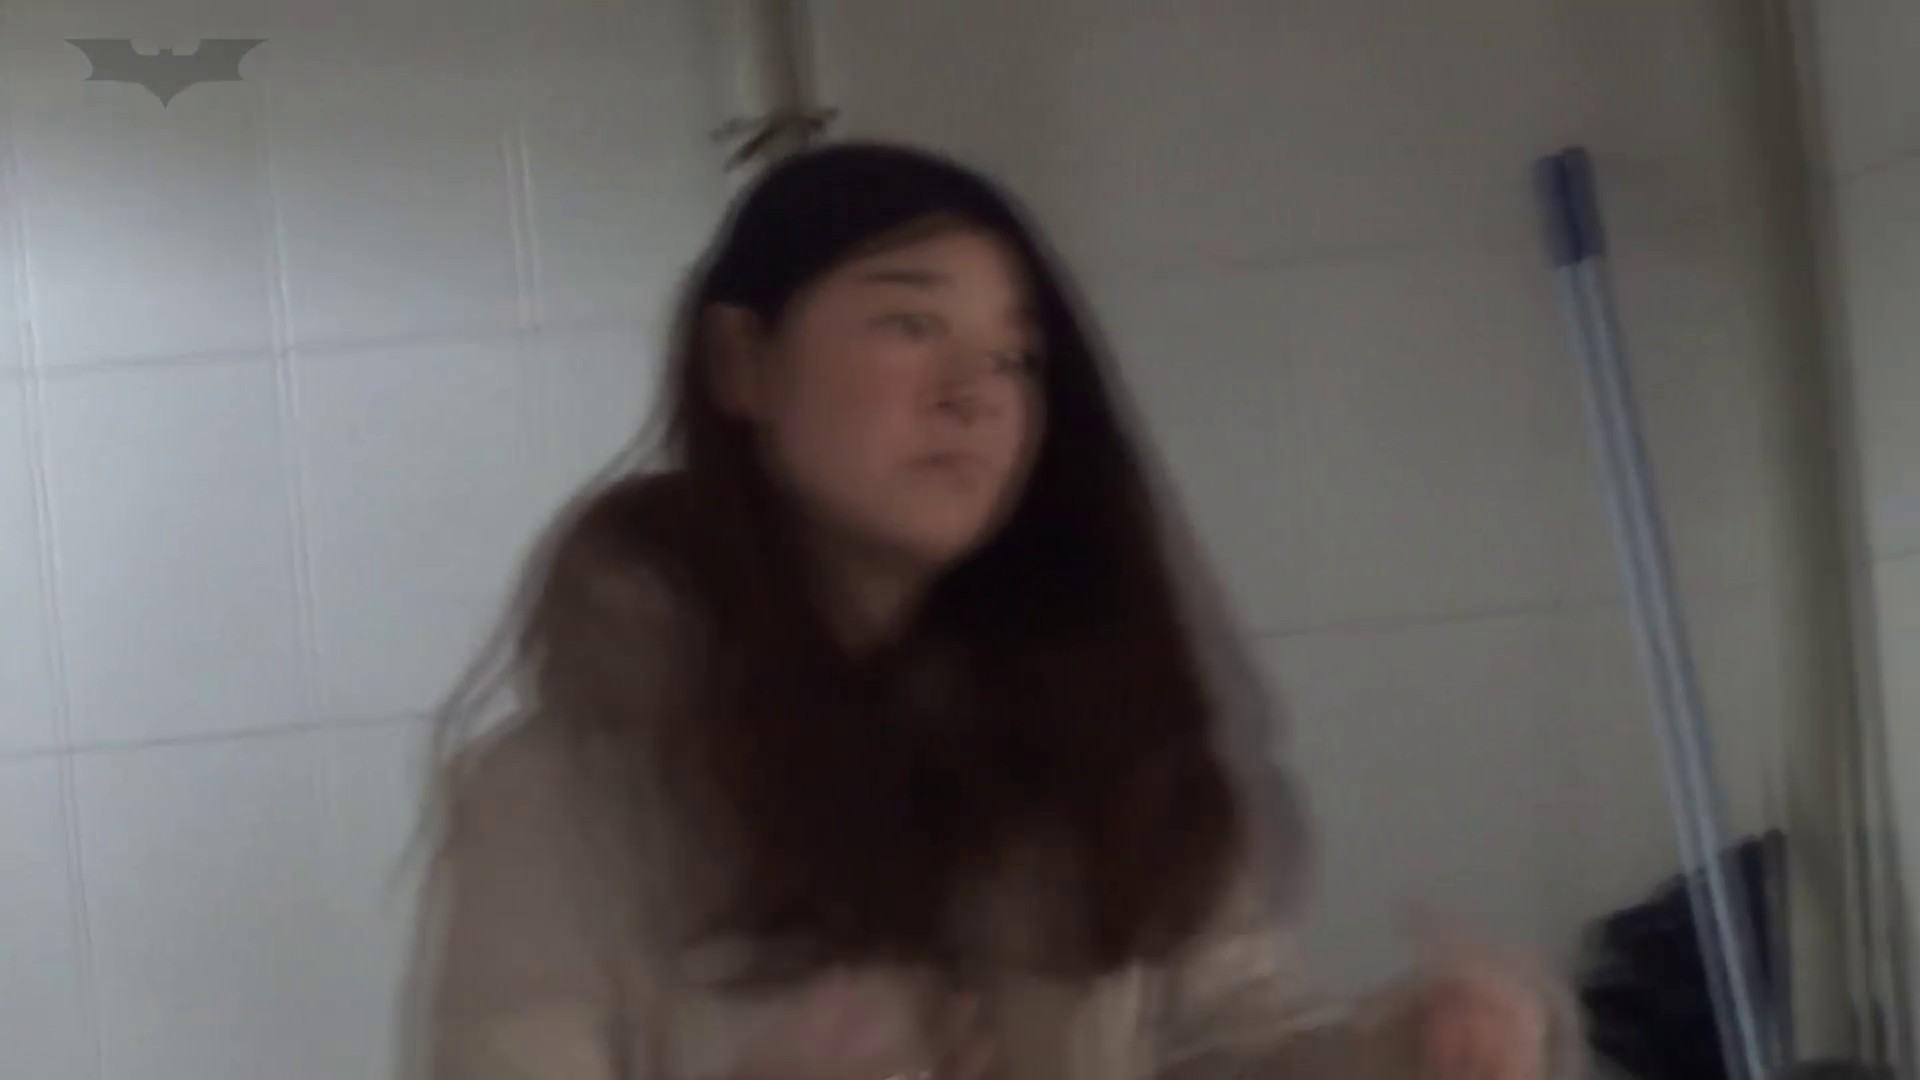 JD盗撮 美女の洗面所の秘密 Vol.29 むっちり オメコ動画キャプチャ 87画像 47